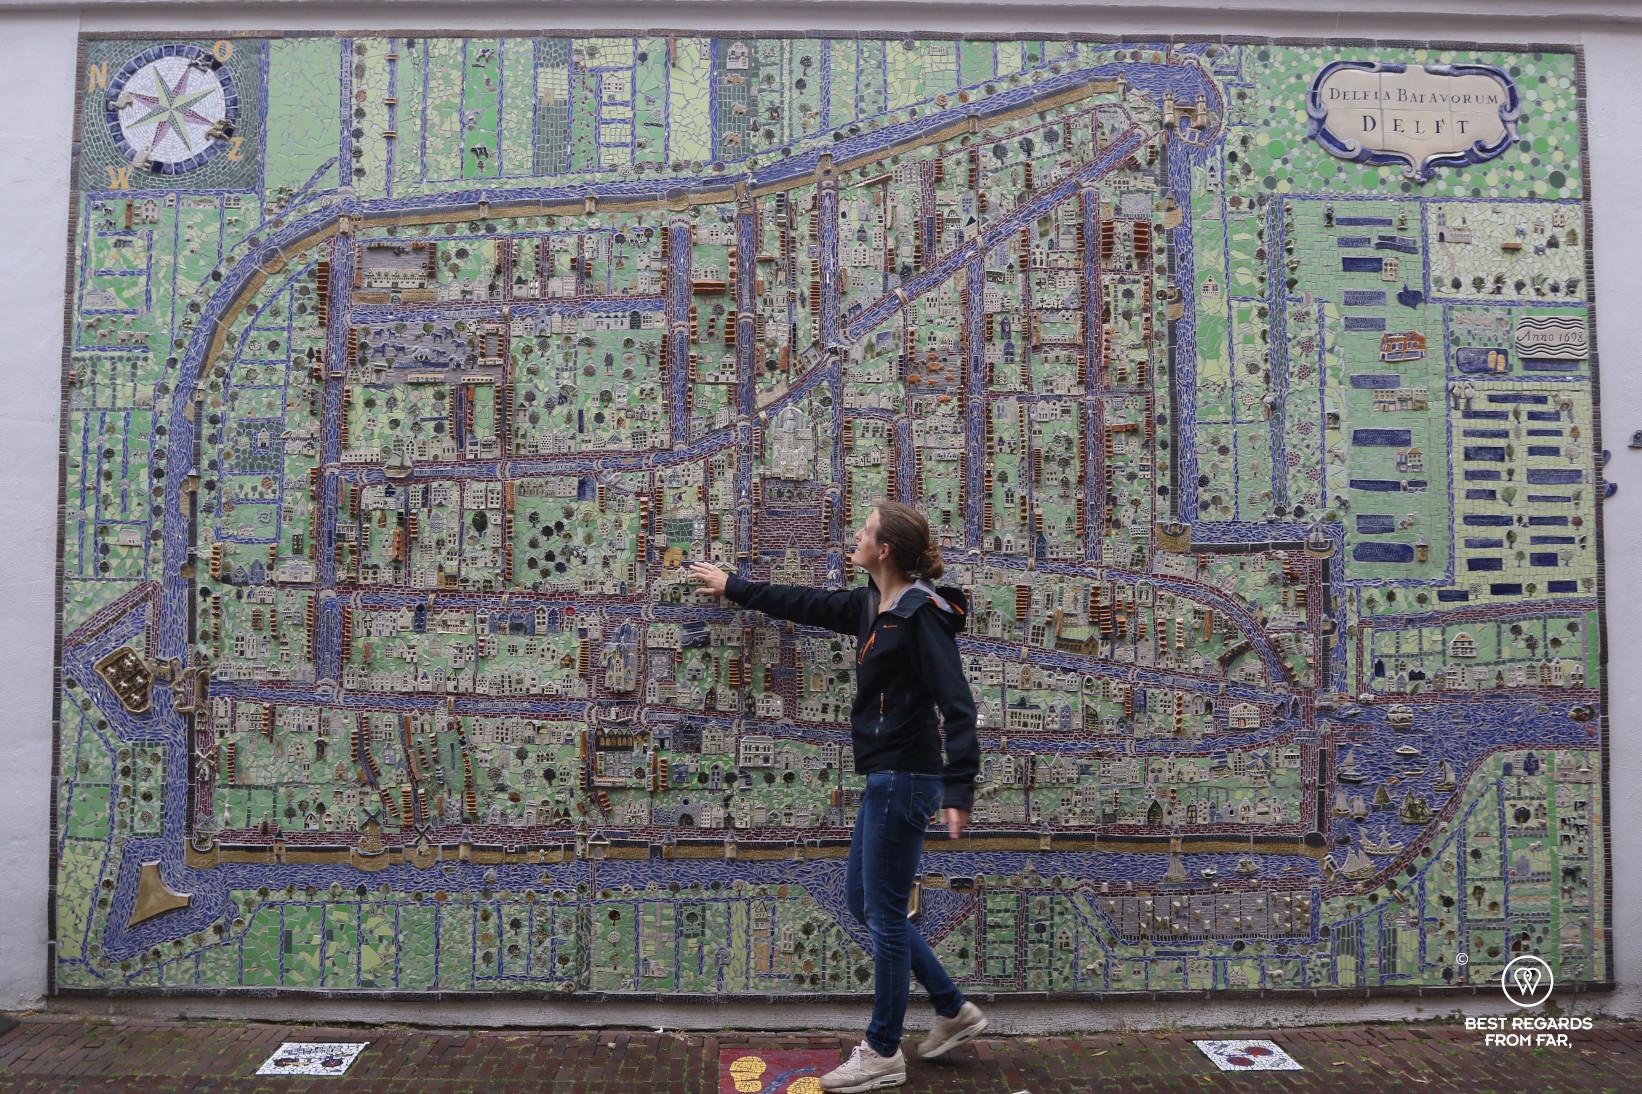 Photographer Marcella van Alphen in front of the Delft ceramic map